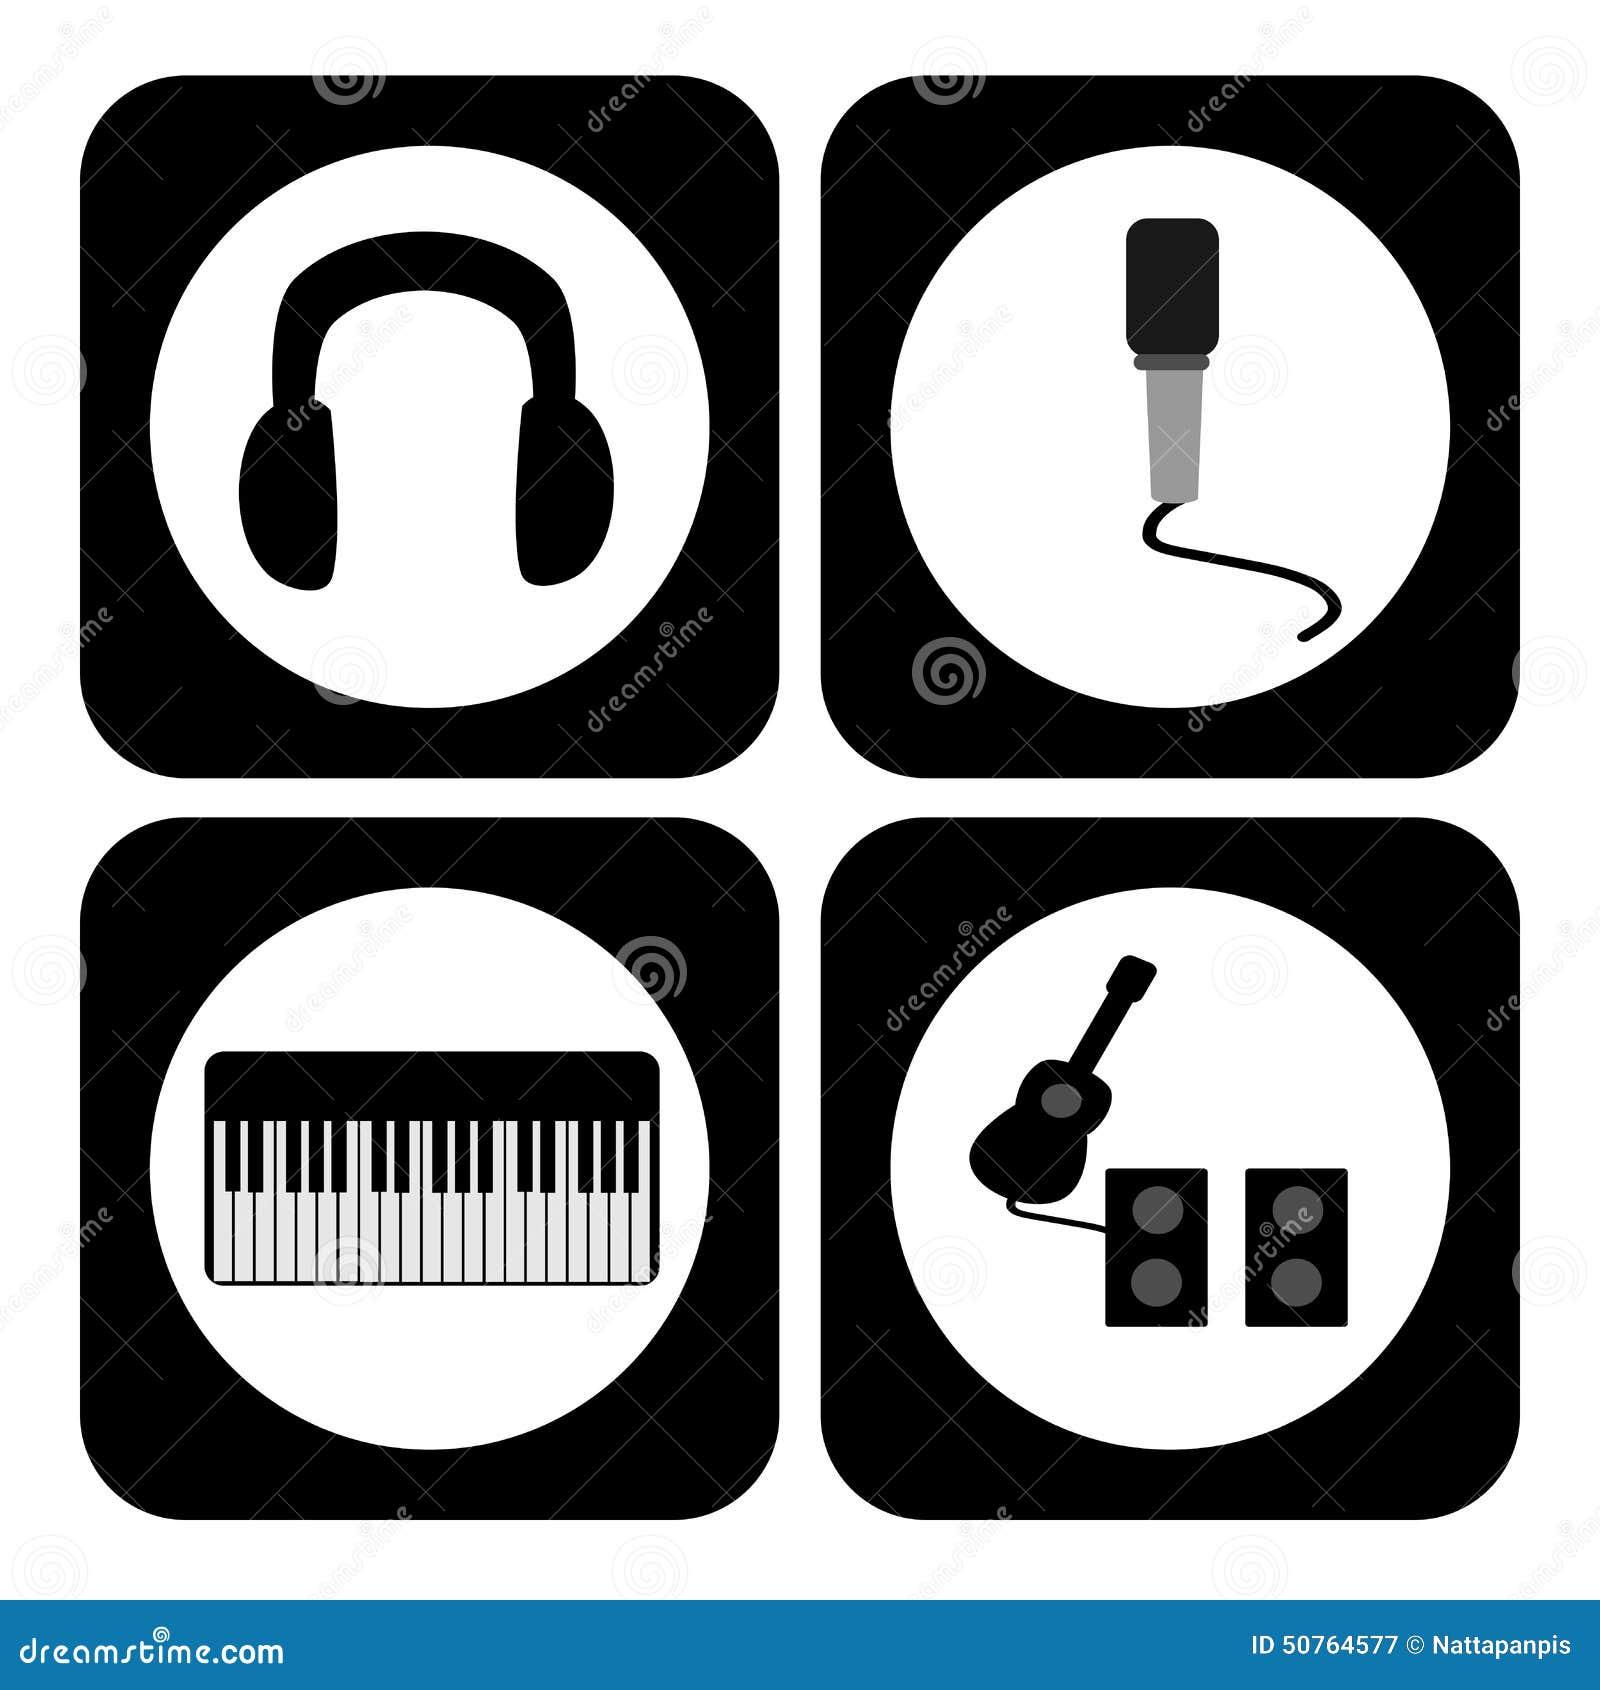 Music symbol stock vector illustration of musical guitar 50764577 music symbol biocorpaavc Images